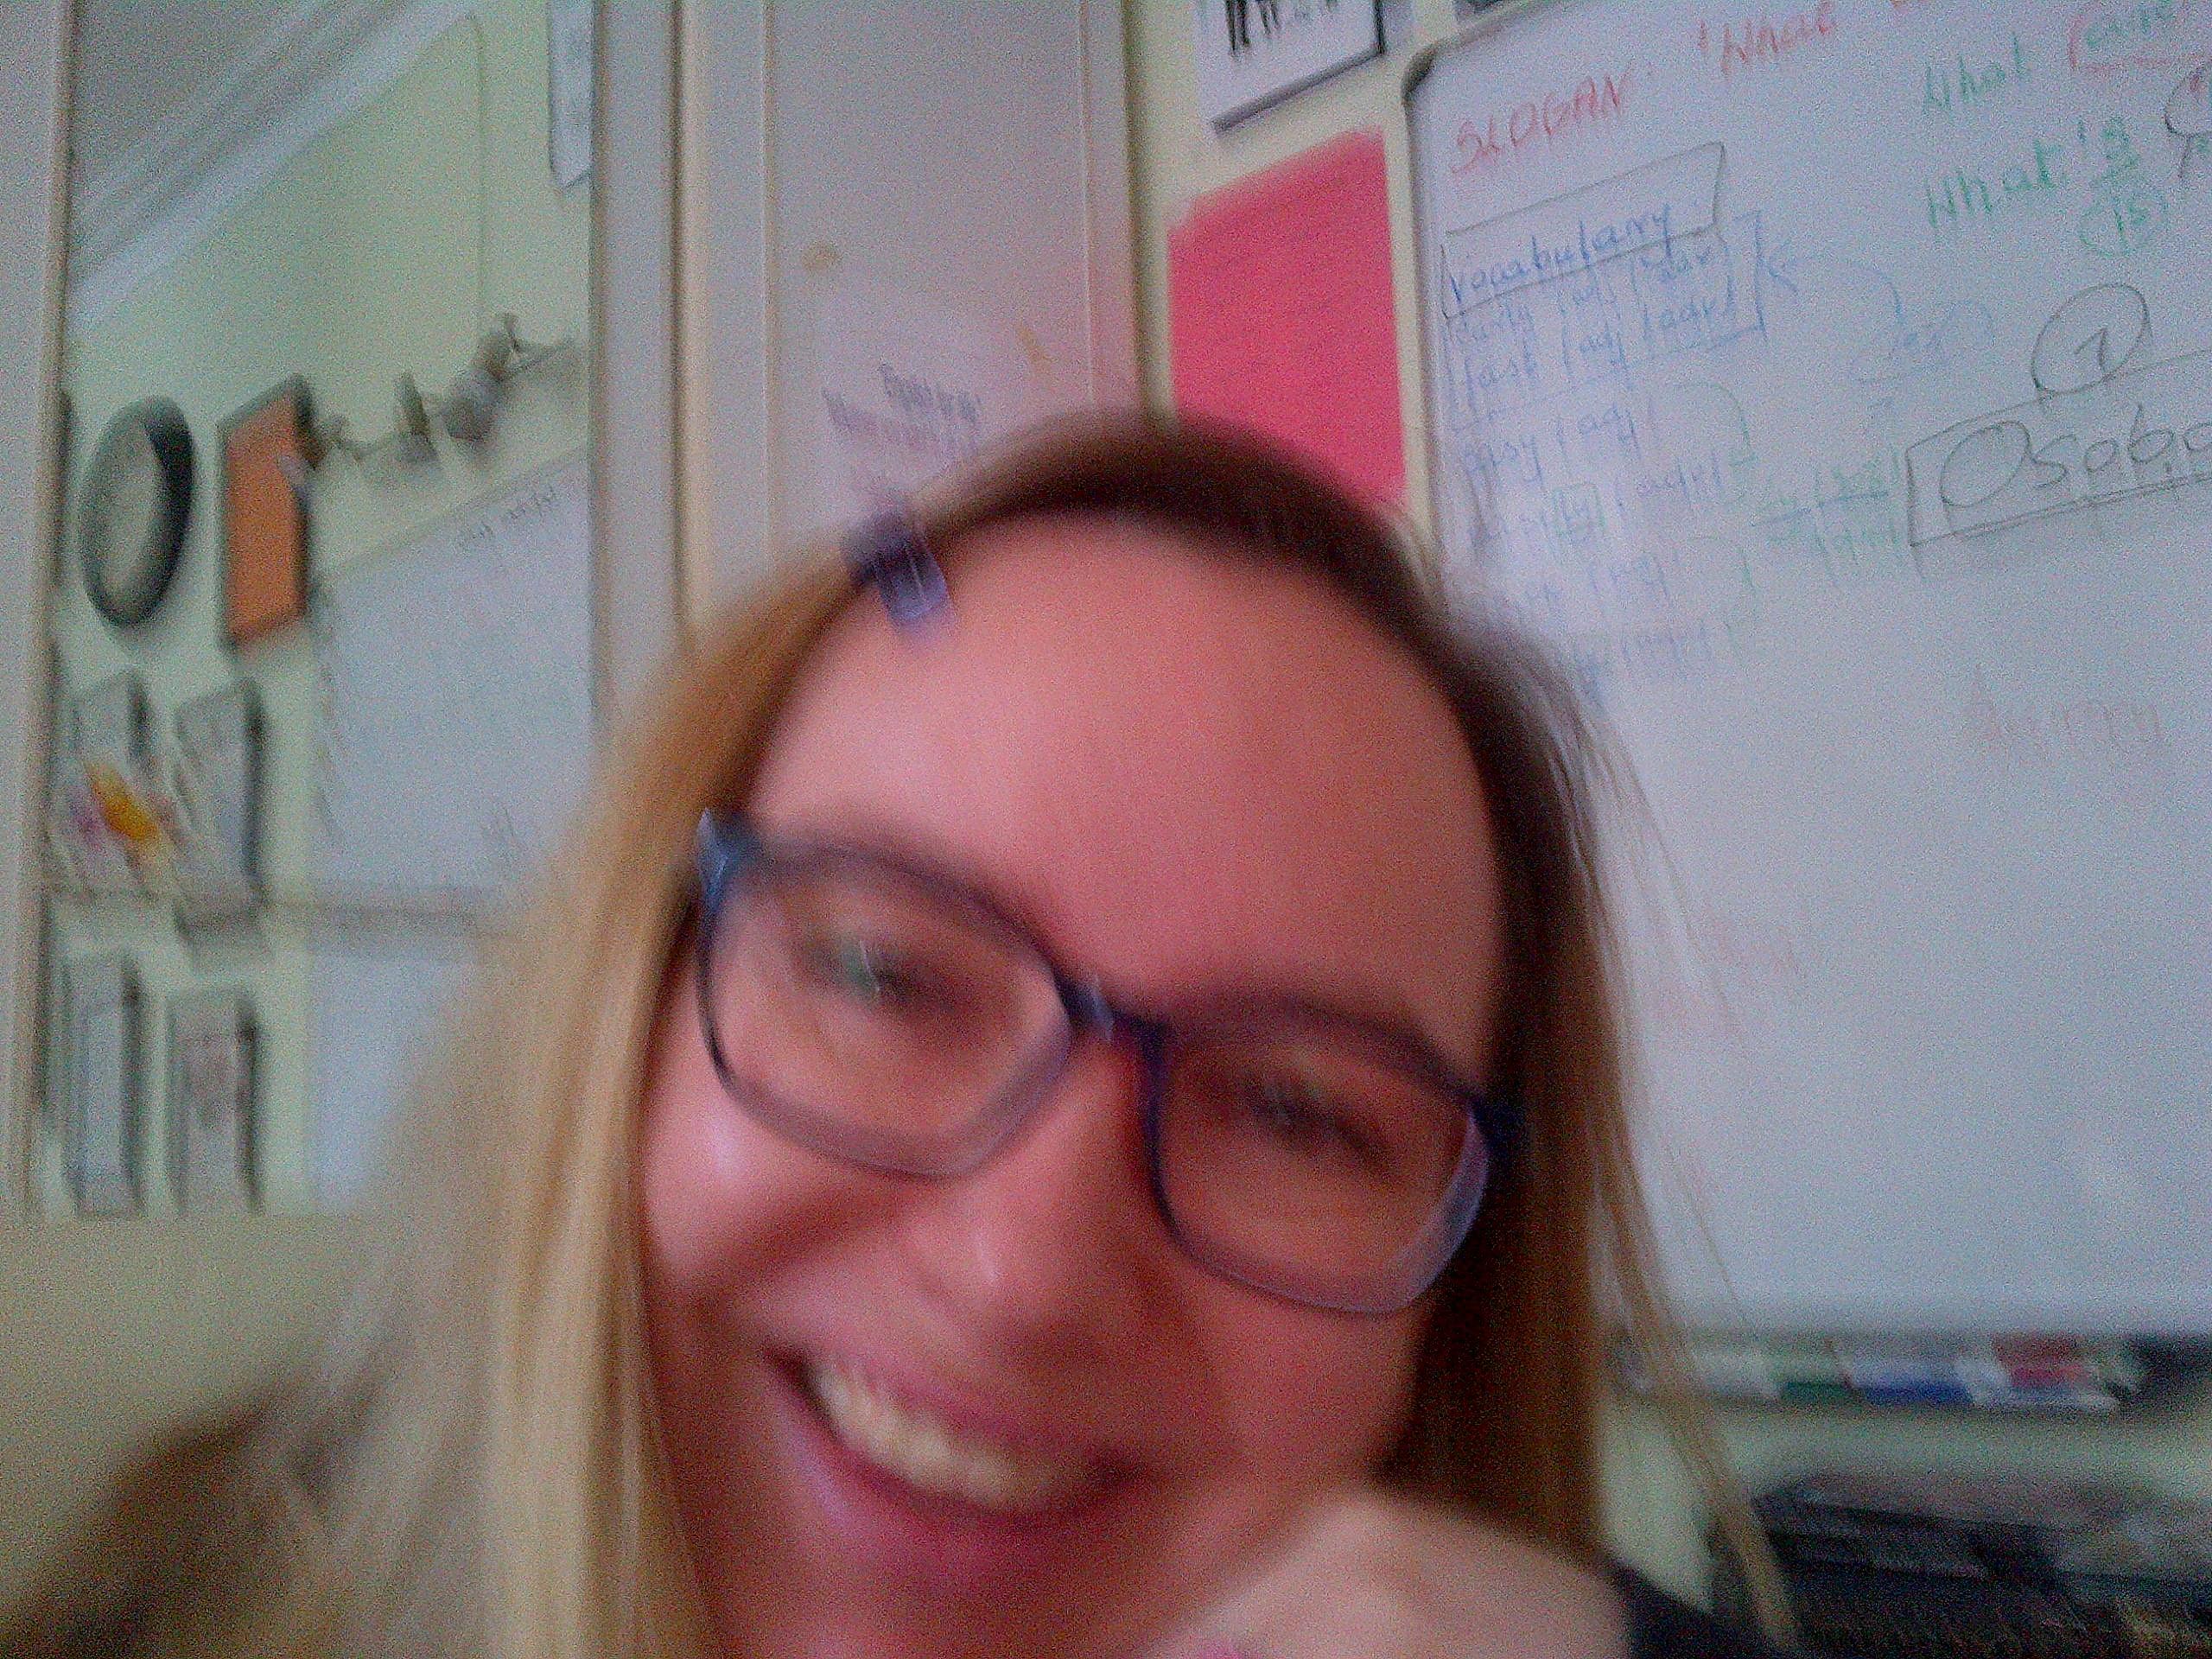 Ms. Anna Tutor